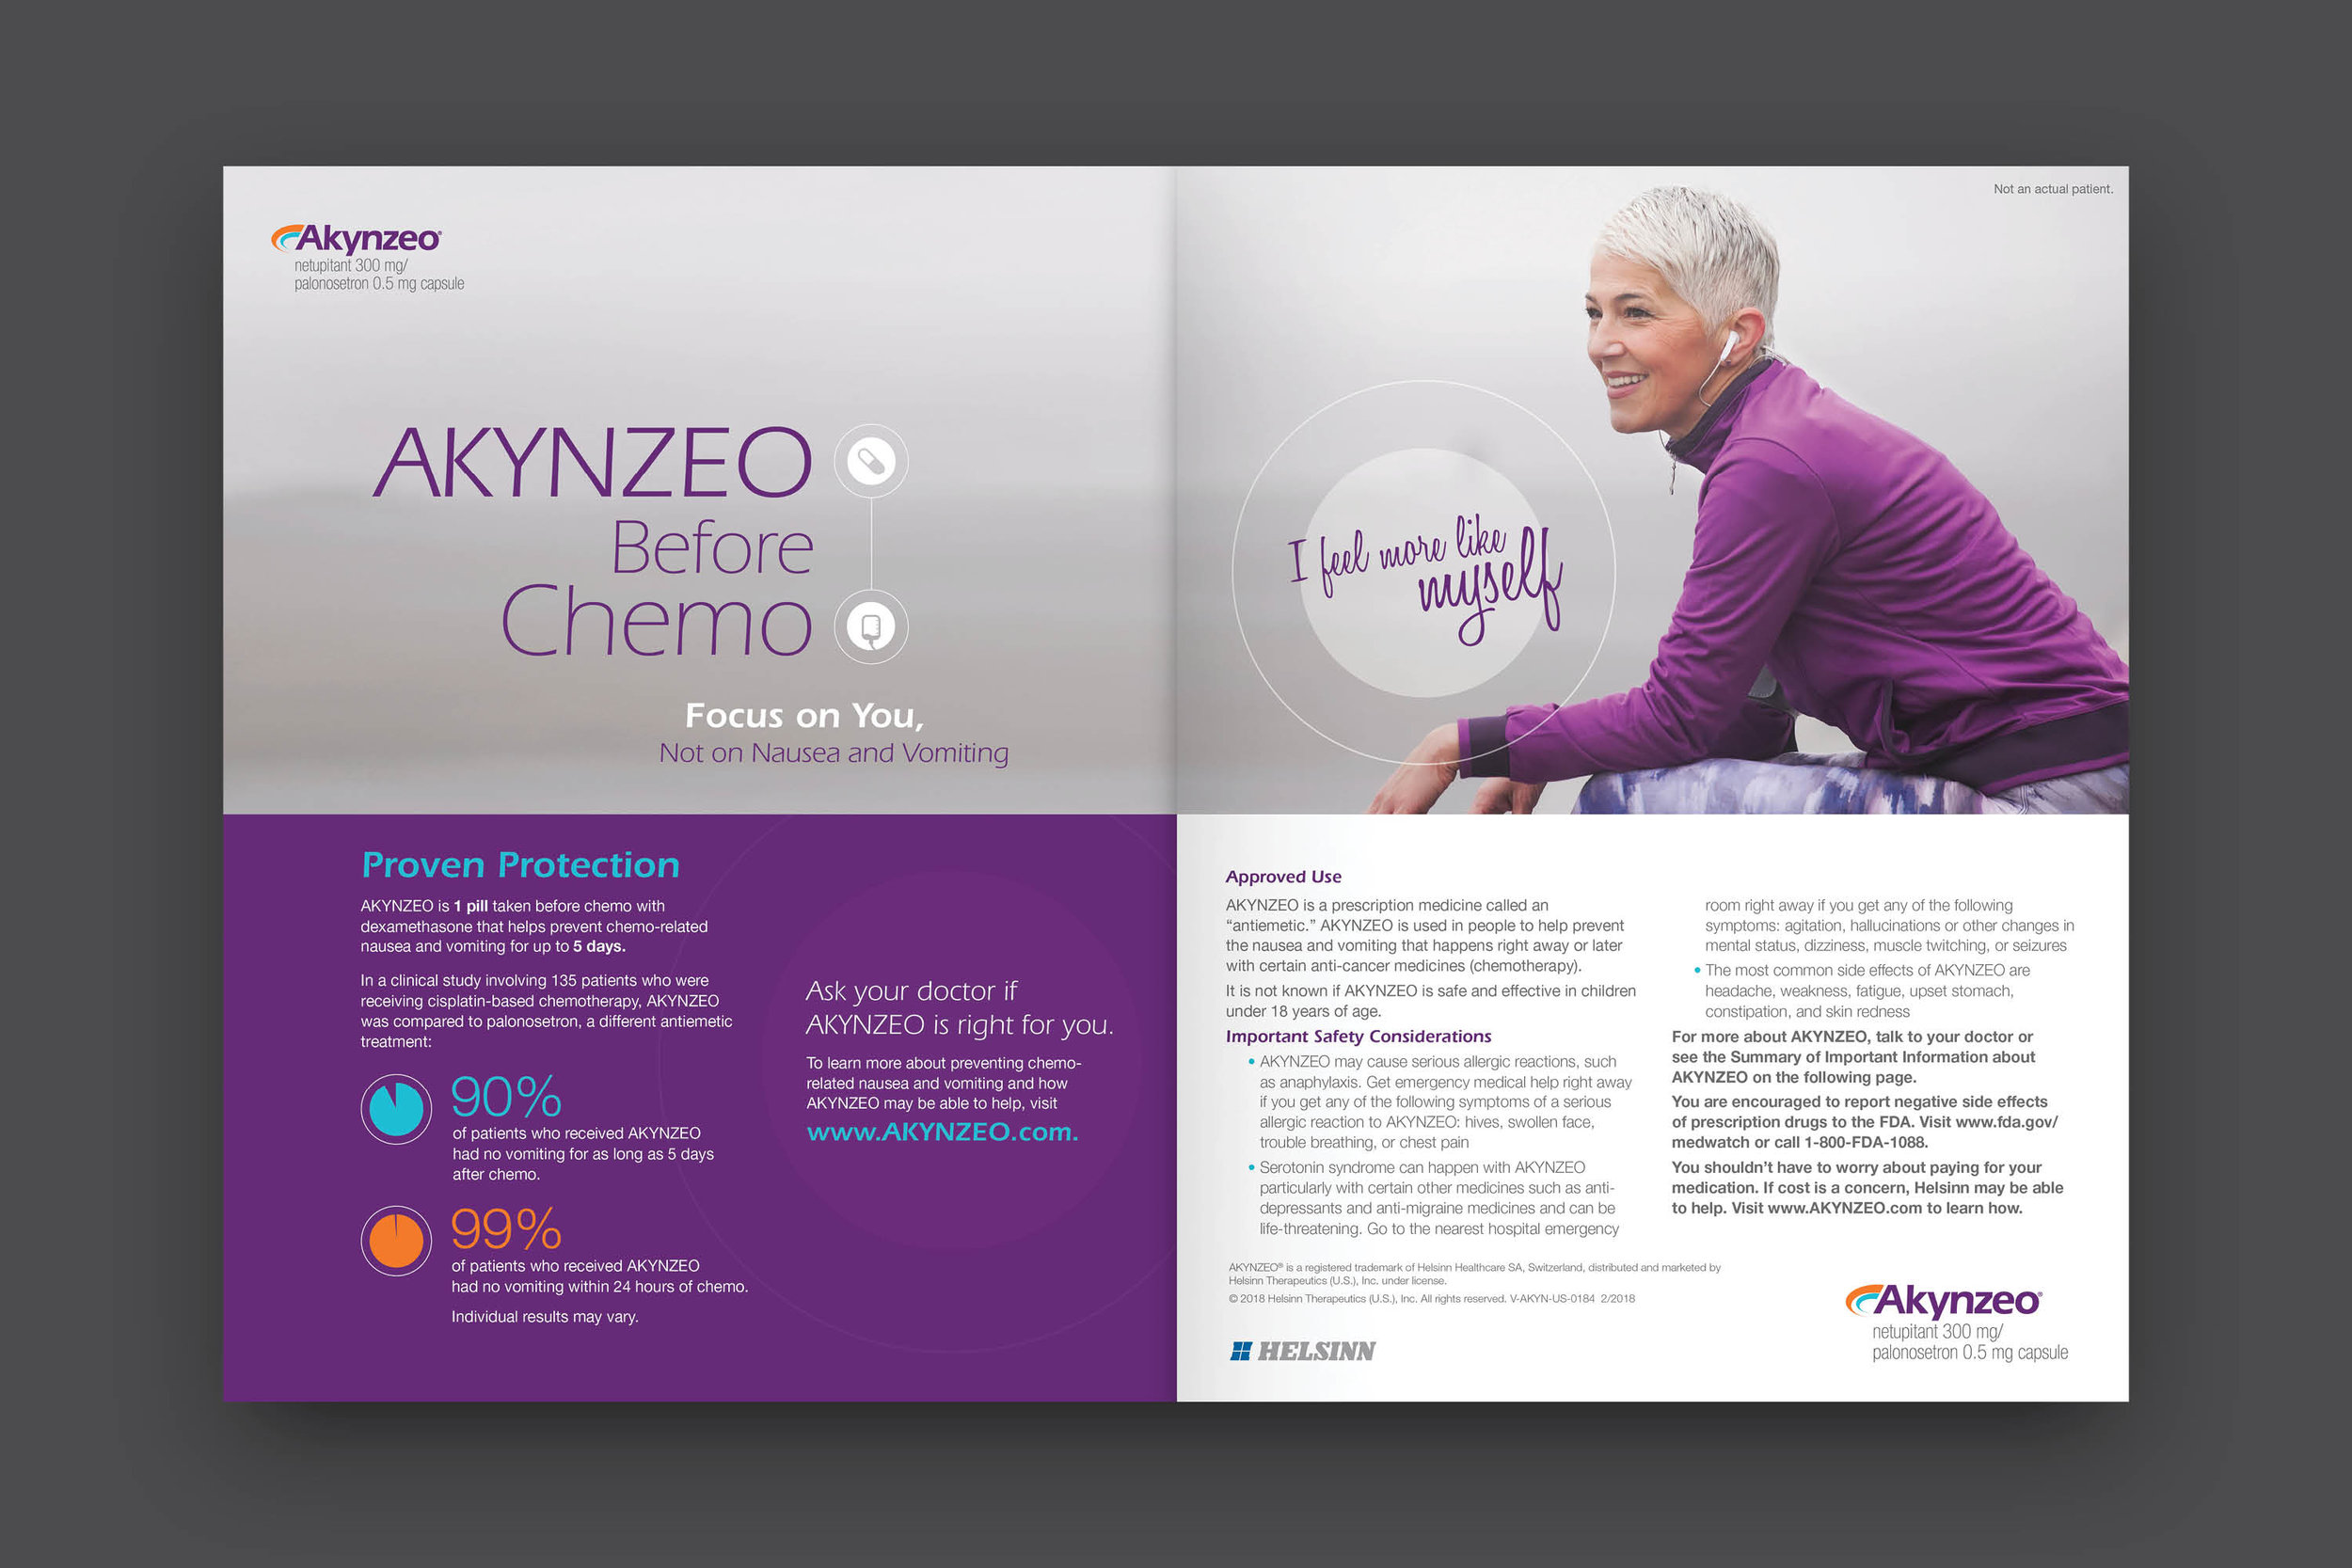 Akynzeo+Ad-1.jpg